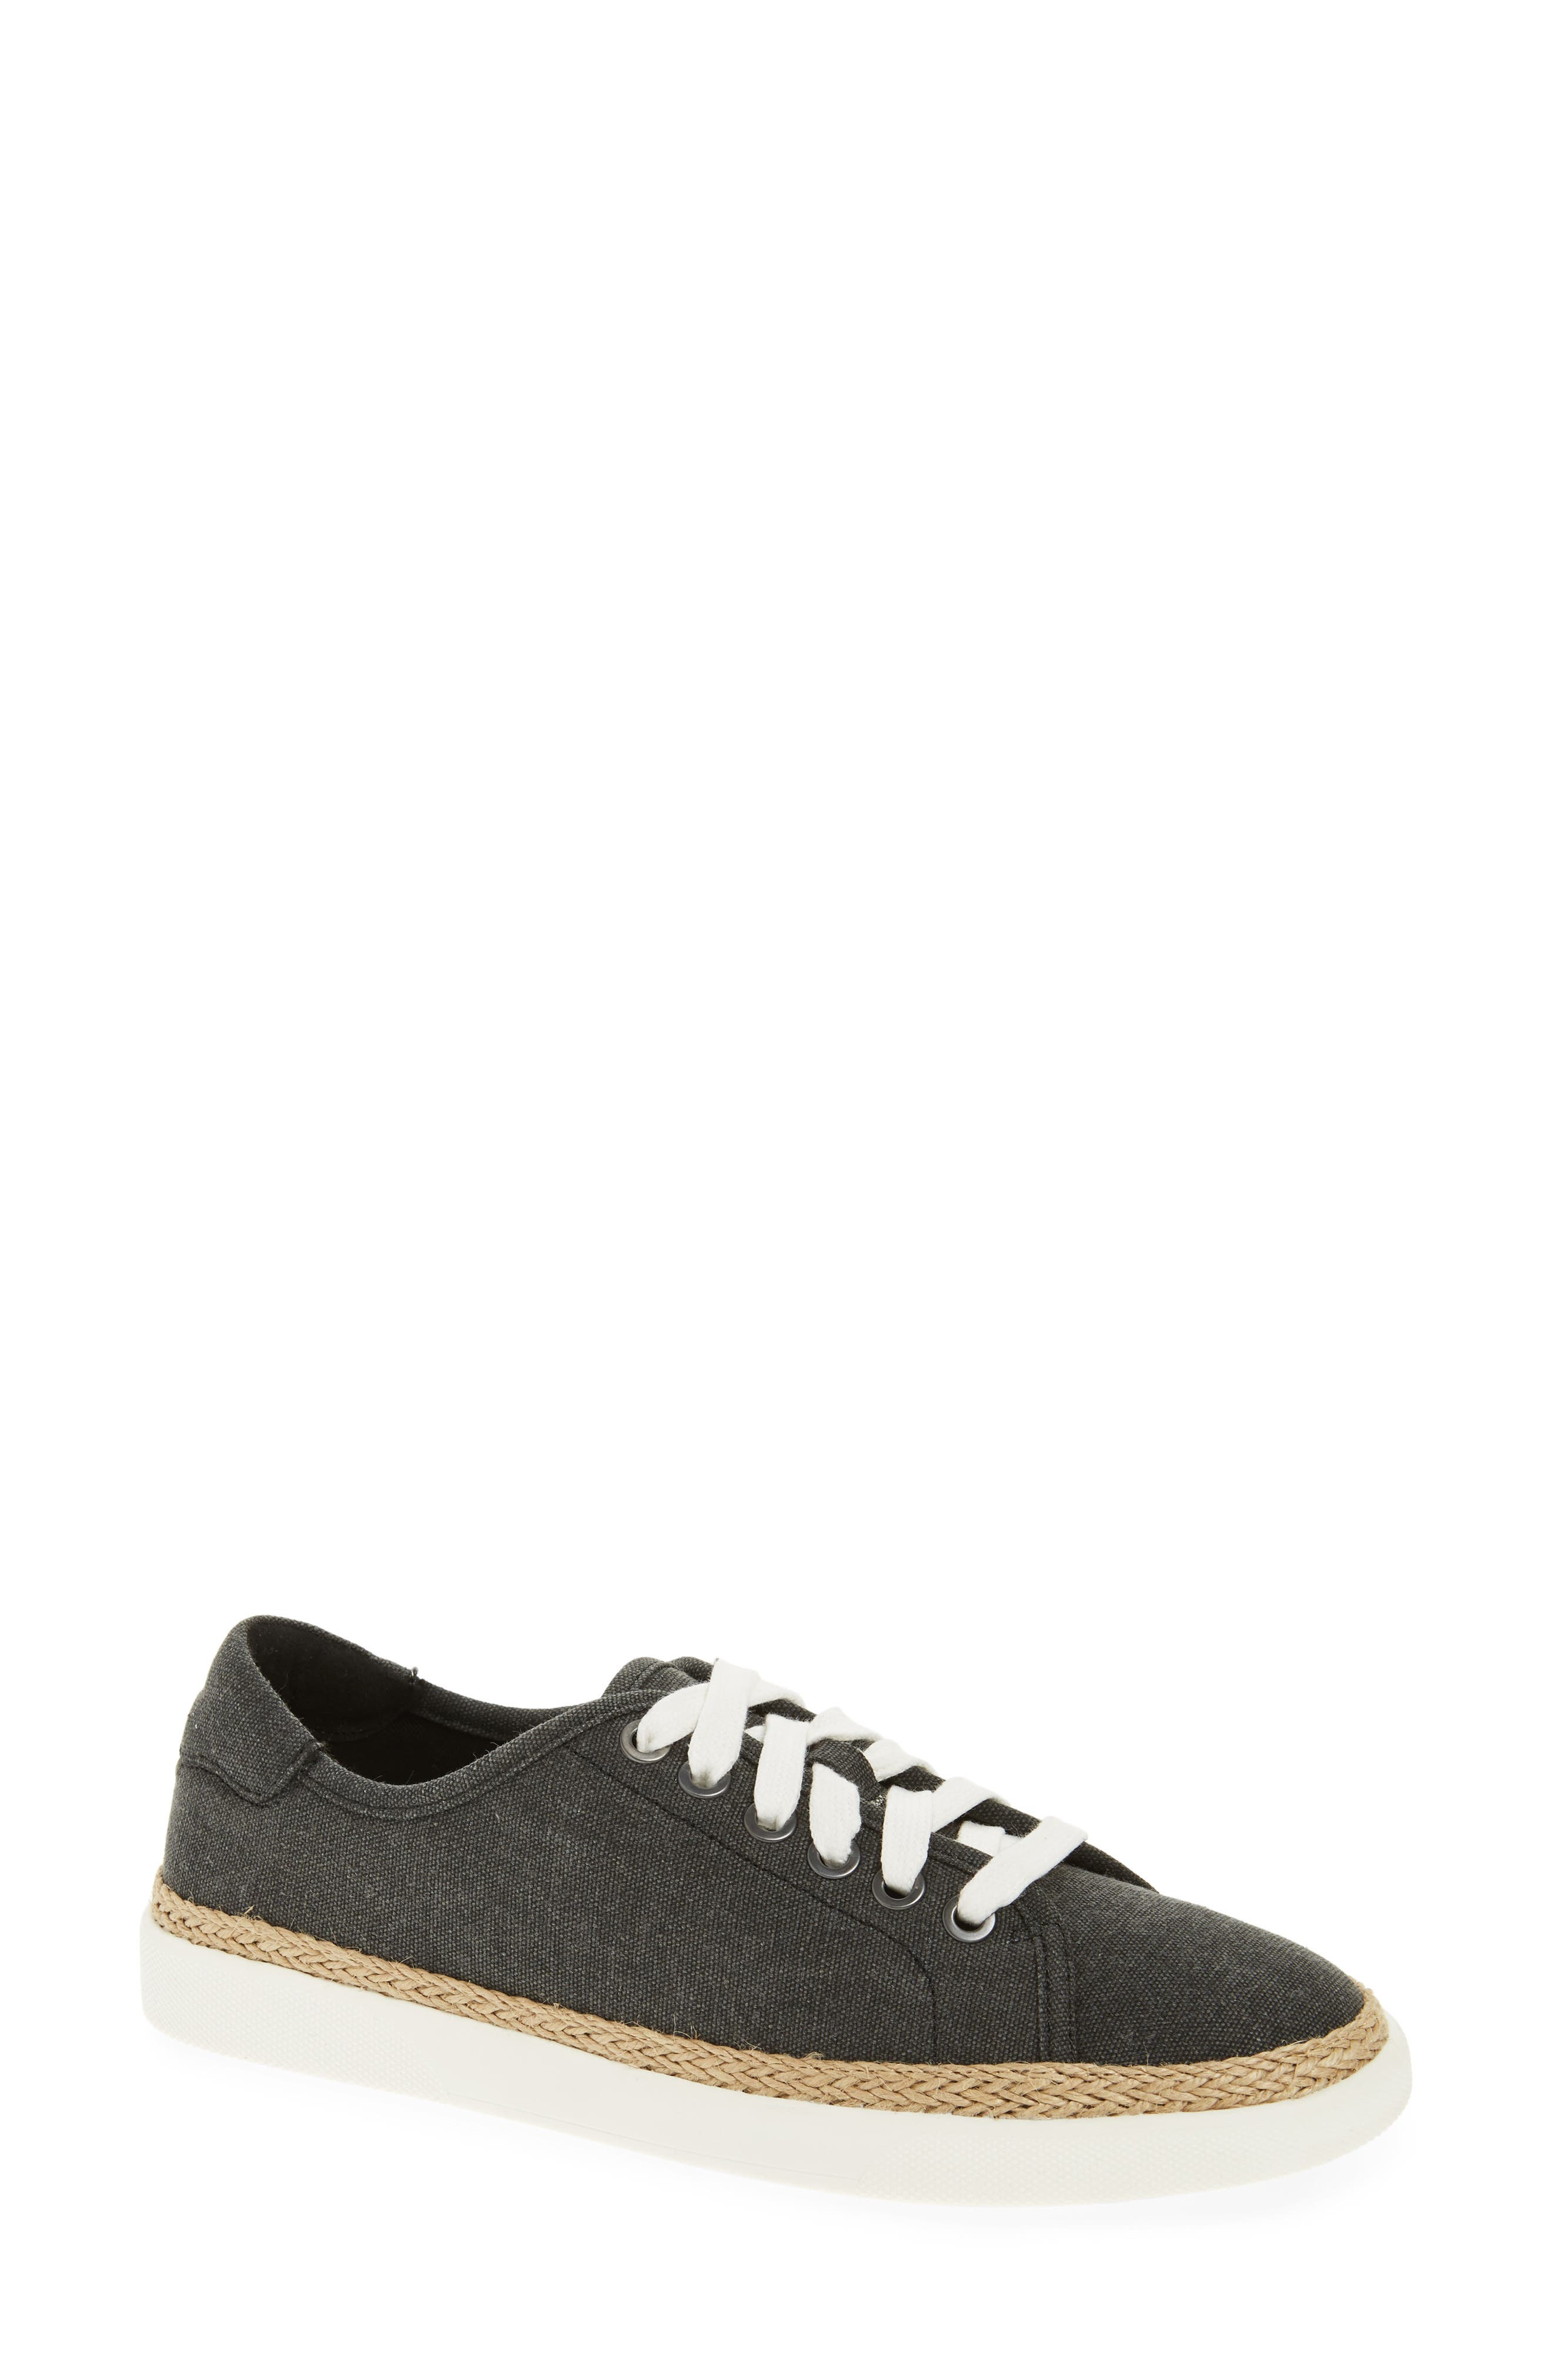 Hattie Sneaker,                         Main,                         color, 001